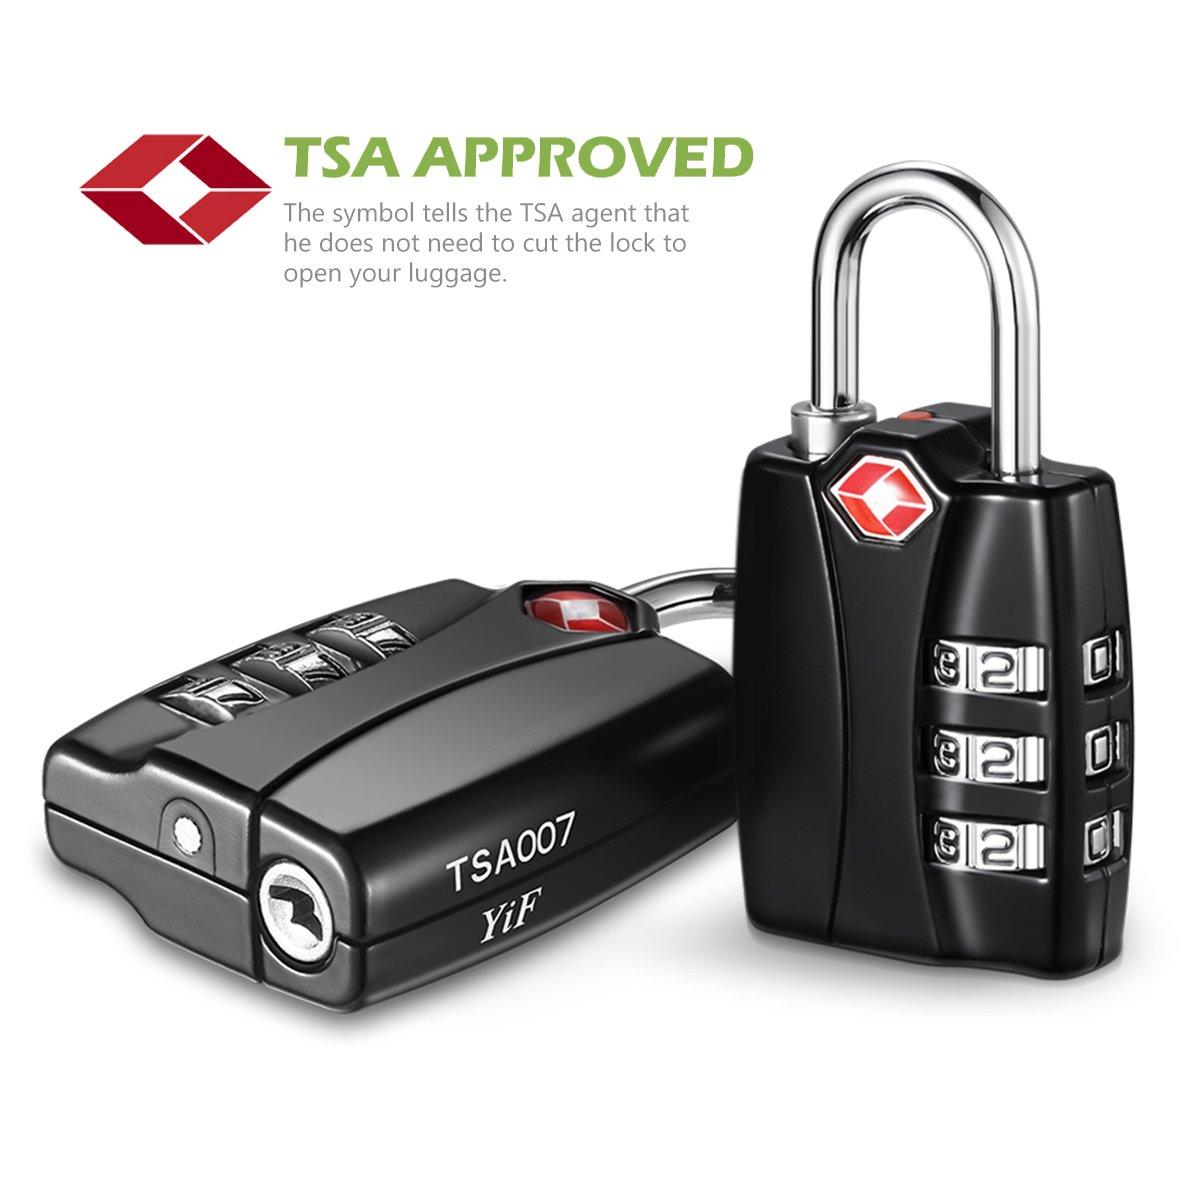 KeeKit Combination Locks, TSA Approved Luggage Locks with Open Alert Indicator, TSA Luggage Locks for Travel, Suitcase, Baggage & Backpack, Gym Locker (Black, 2 Pack) by KeeKit (Image #2)